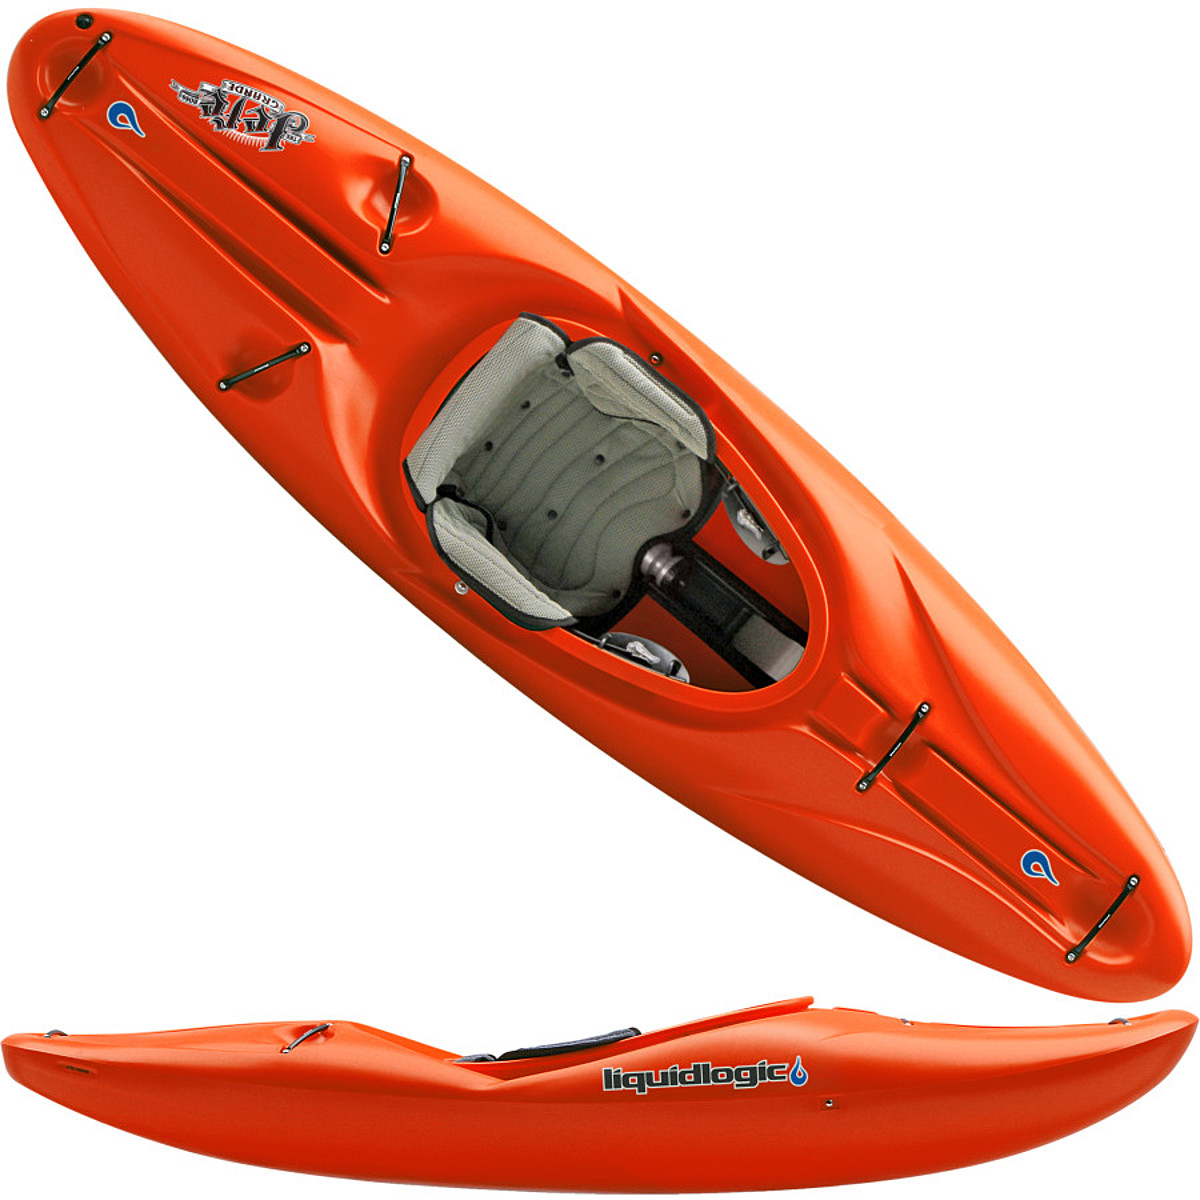 Liquidlogic Remix kayak design - YouTube